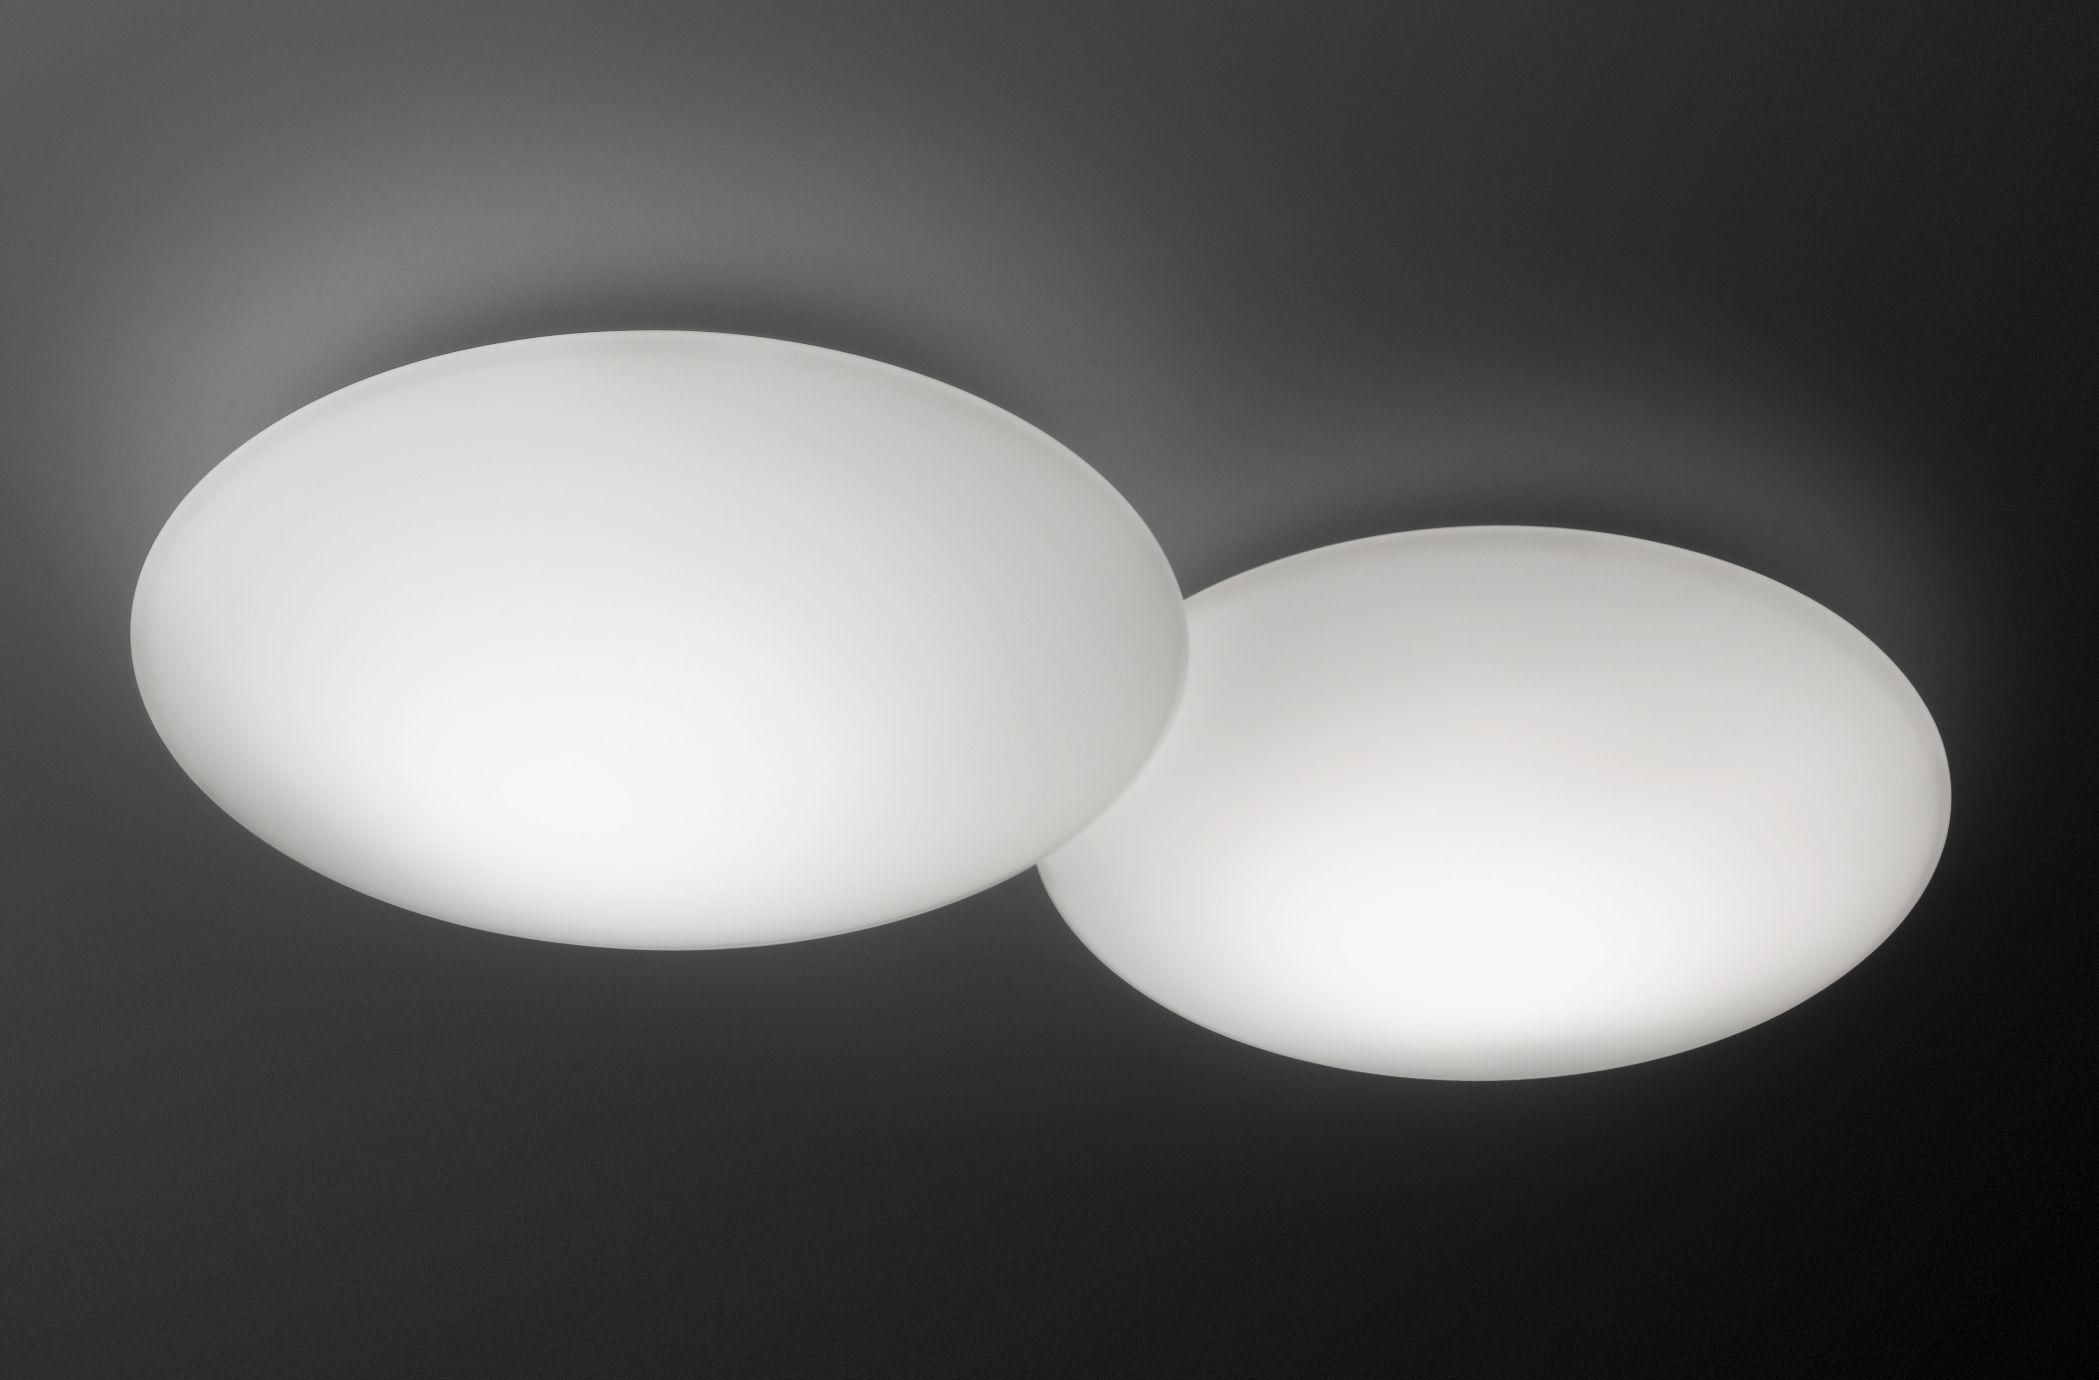 plafonnier puck double blanc vibia. Black Bedroom Furniture Sets. Home Design Ideas